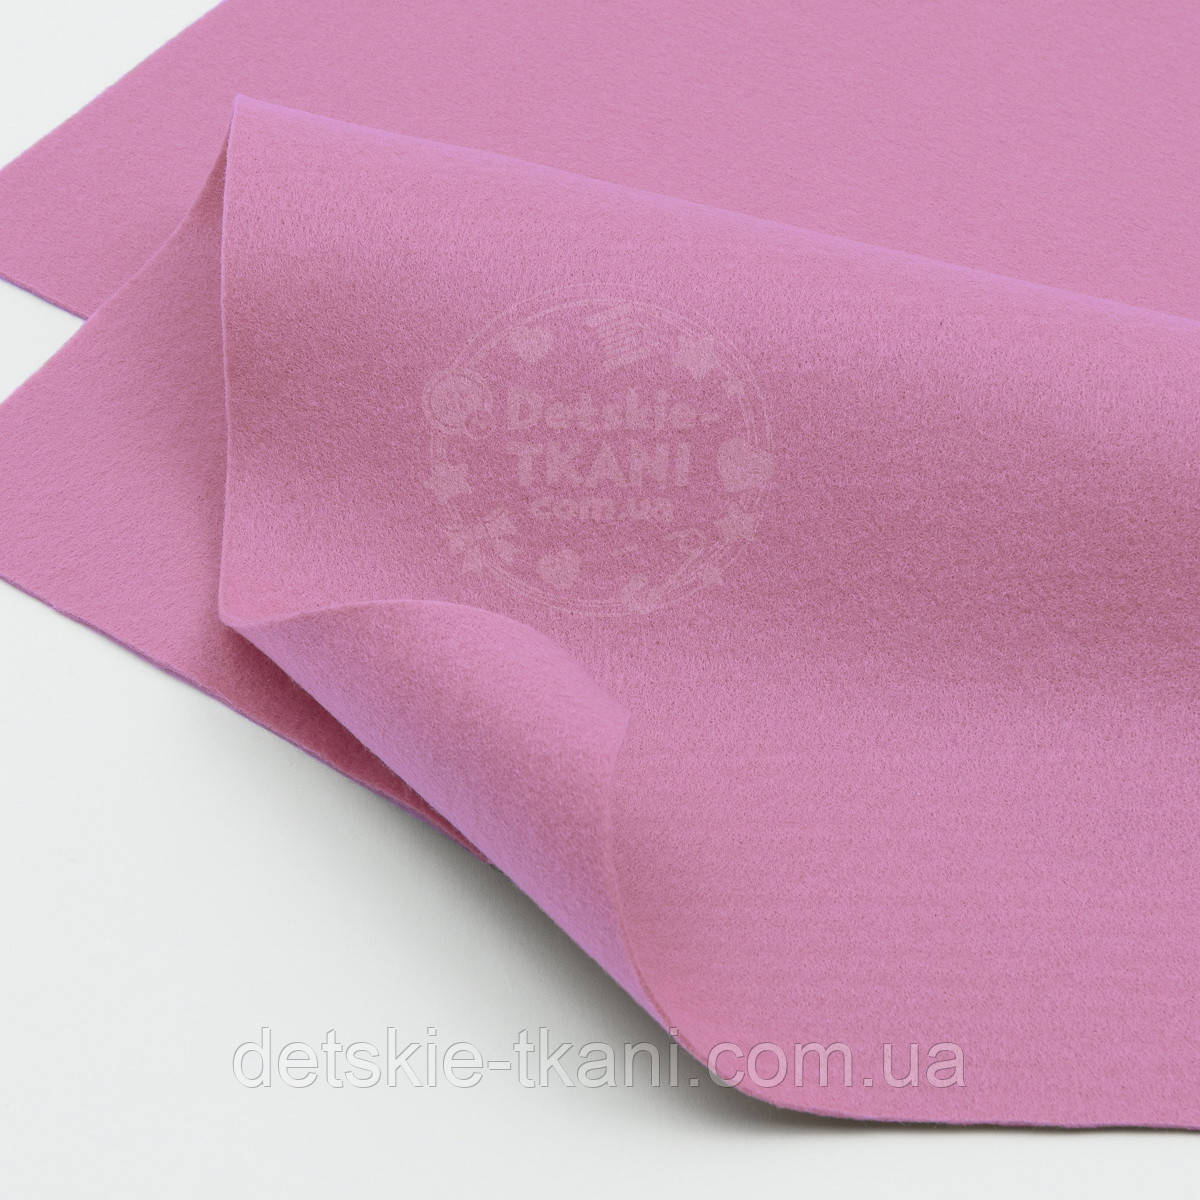 Лоскут фетра светло-сиреневого цвета 20*20 см (ФМ-16)